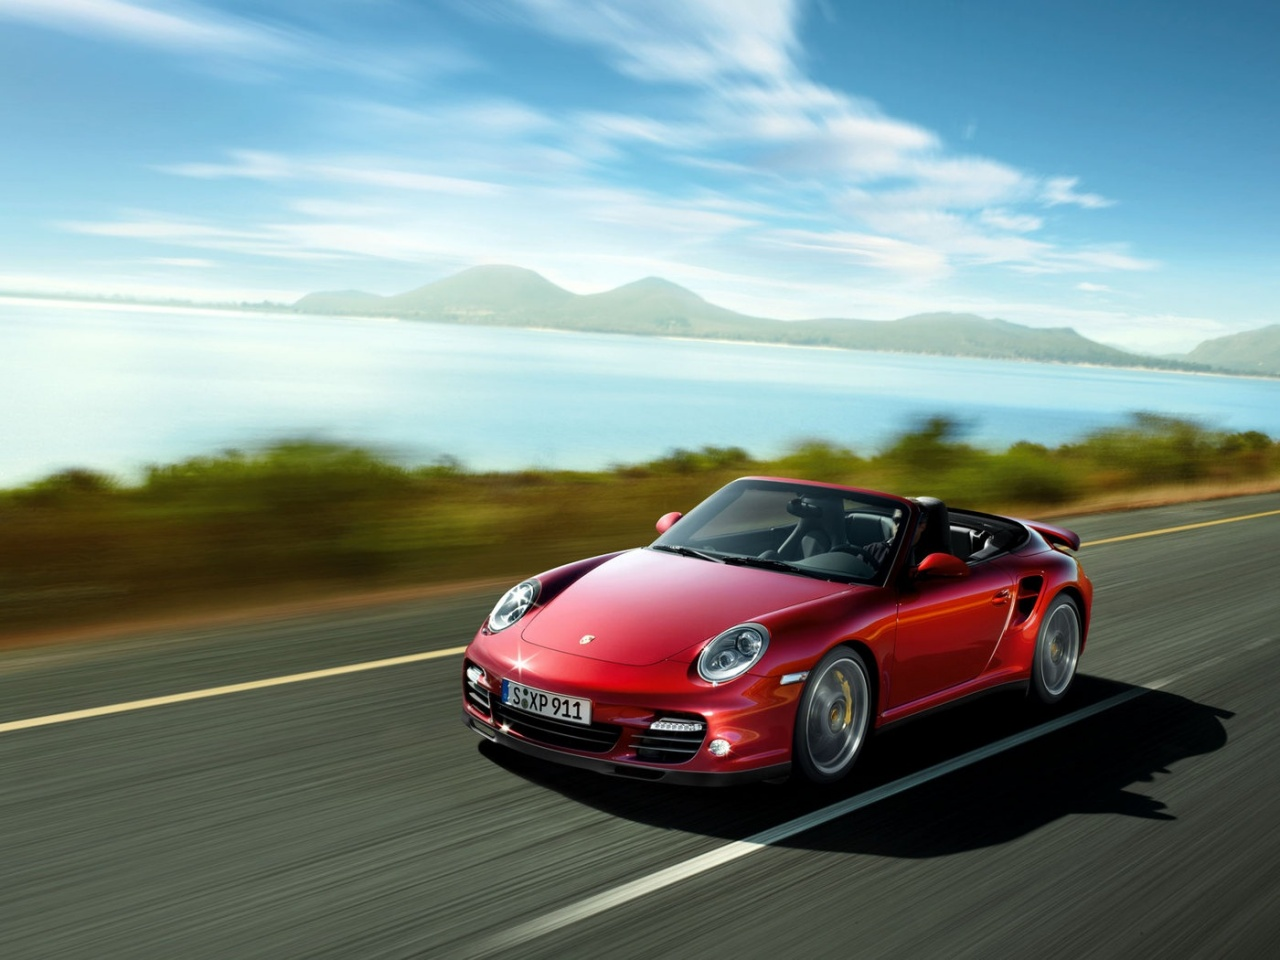 2007 <b>Porsche 911 Turbo</b> - Blue Side - <b>1280x960</b> - <b>Wallpaper</b>